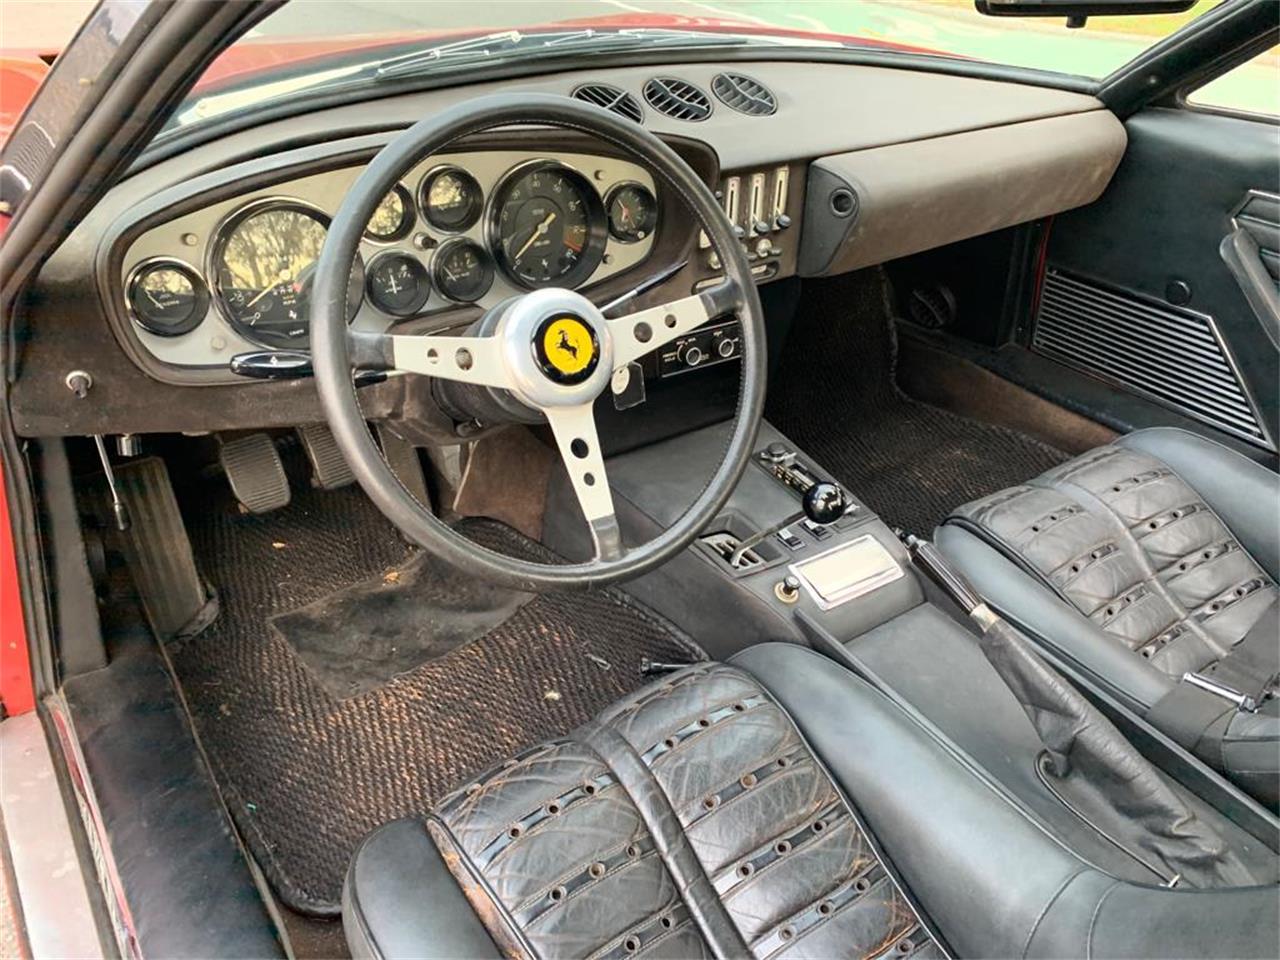 1971 Ferrari 365 GTB/4 (CC-1300434) for sale in Astoria, New York